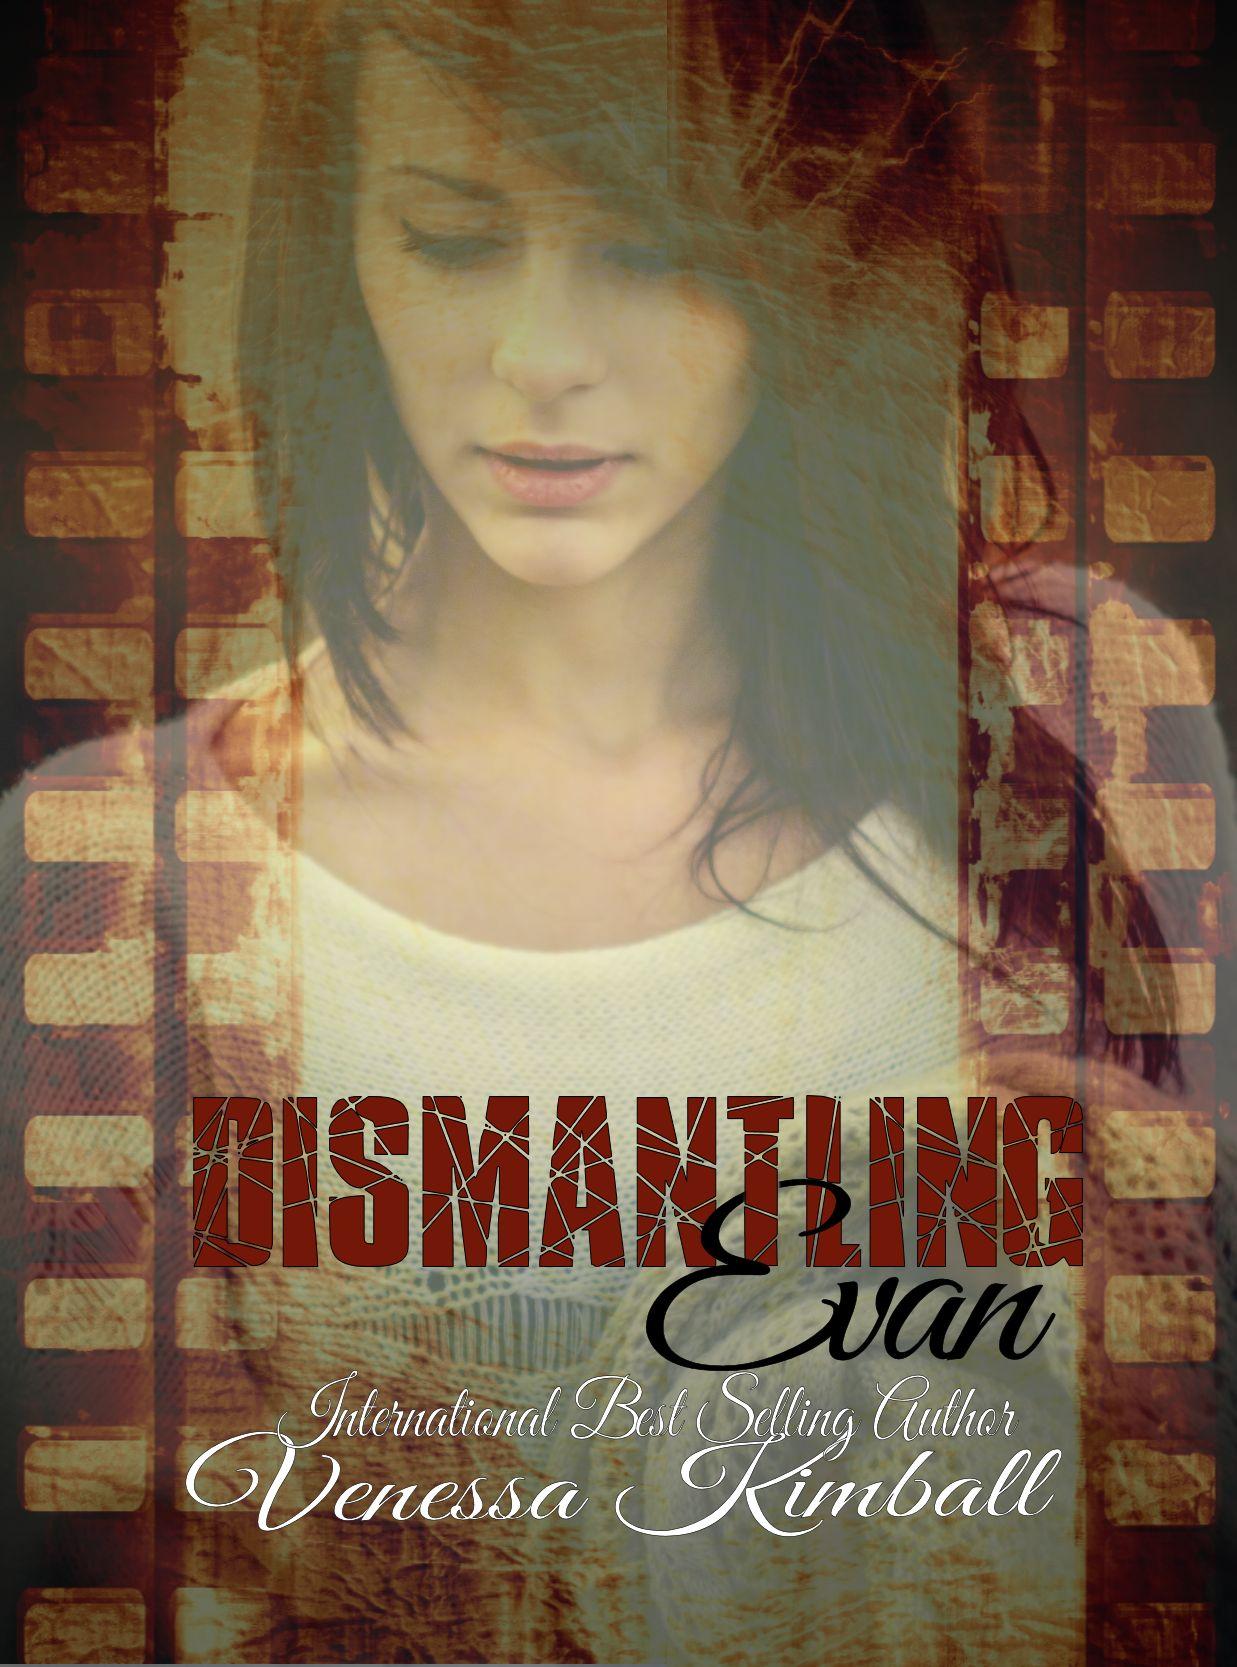 dismantling evan cover final